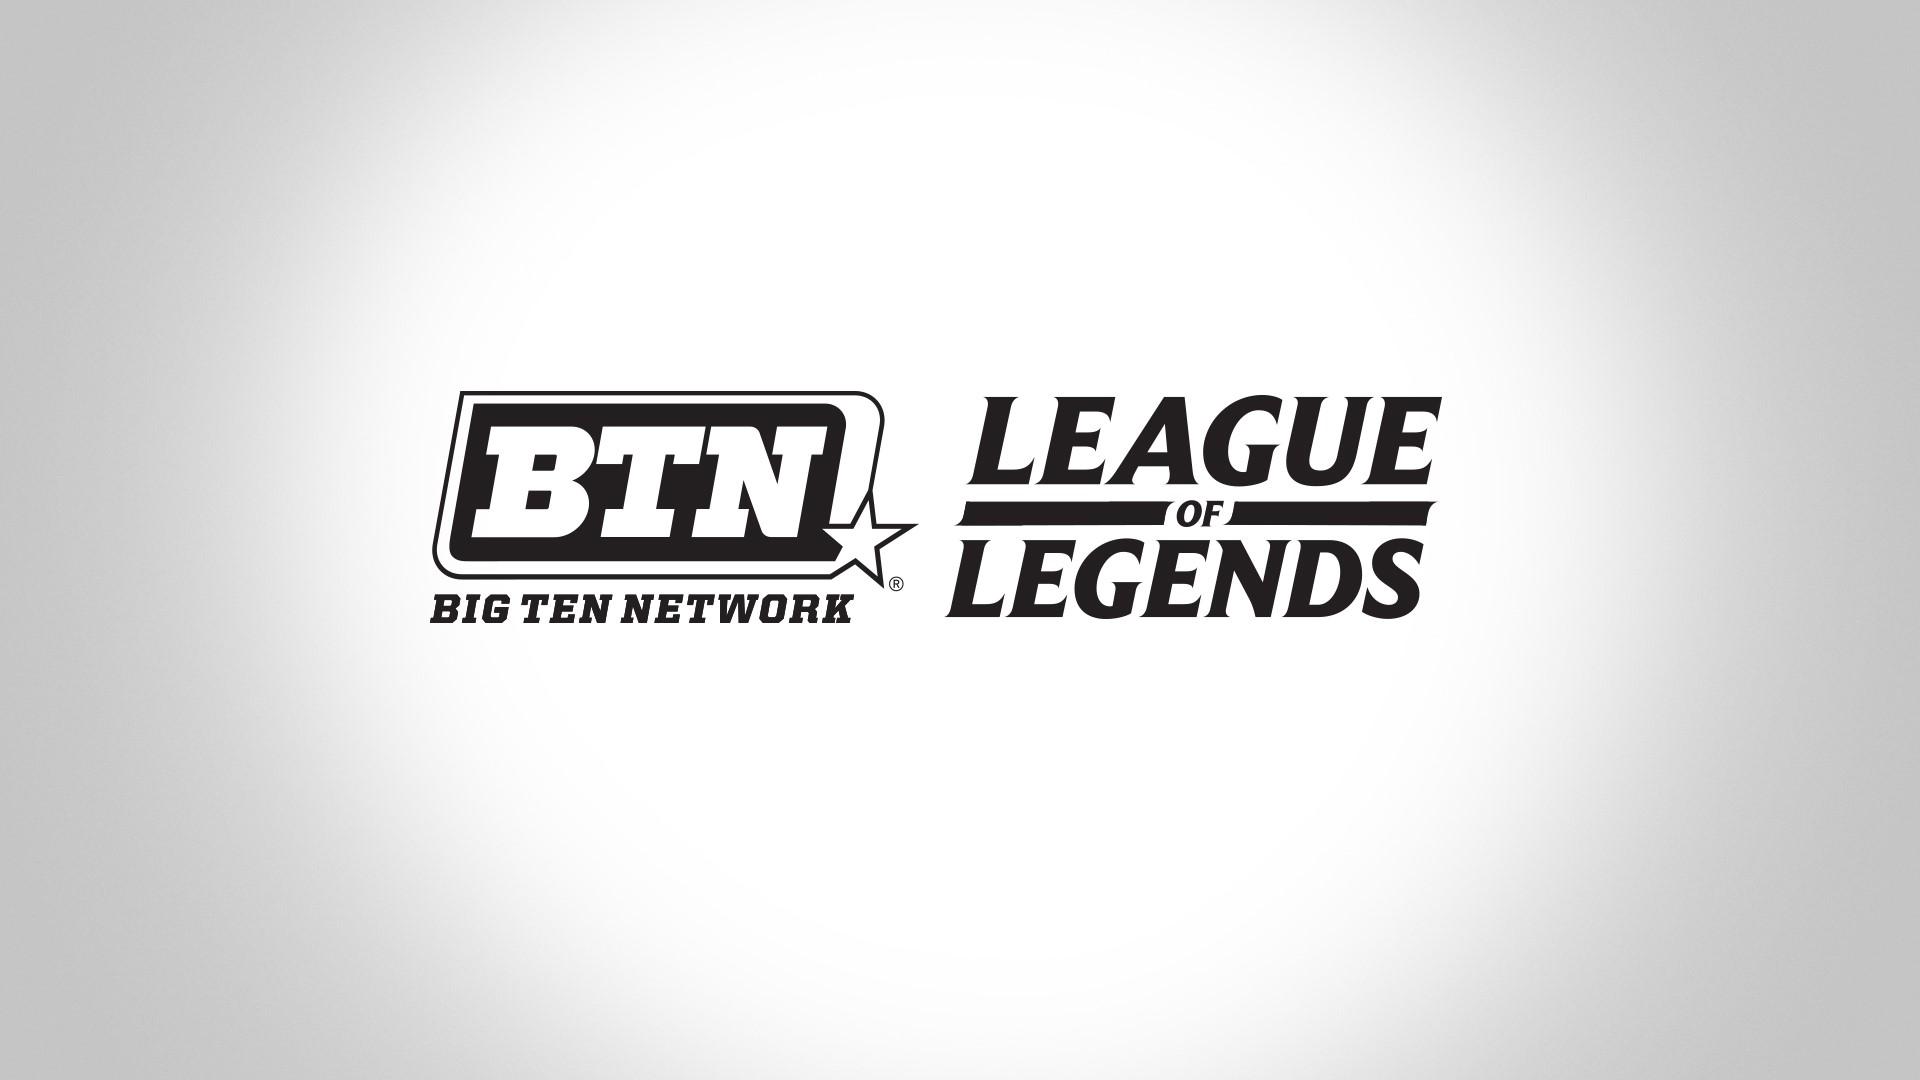 Big Ten Network, Riot Games extend College League of Legends